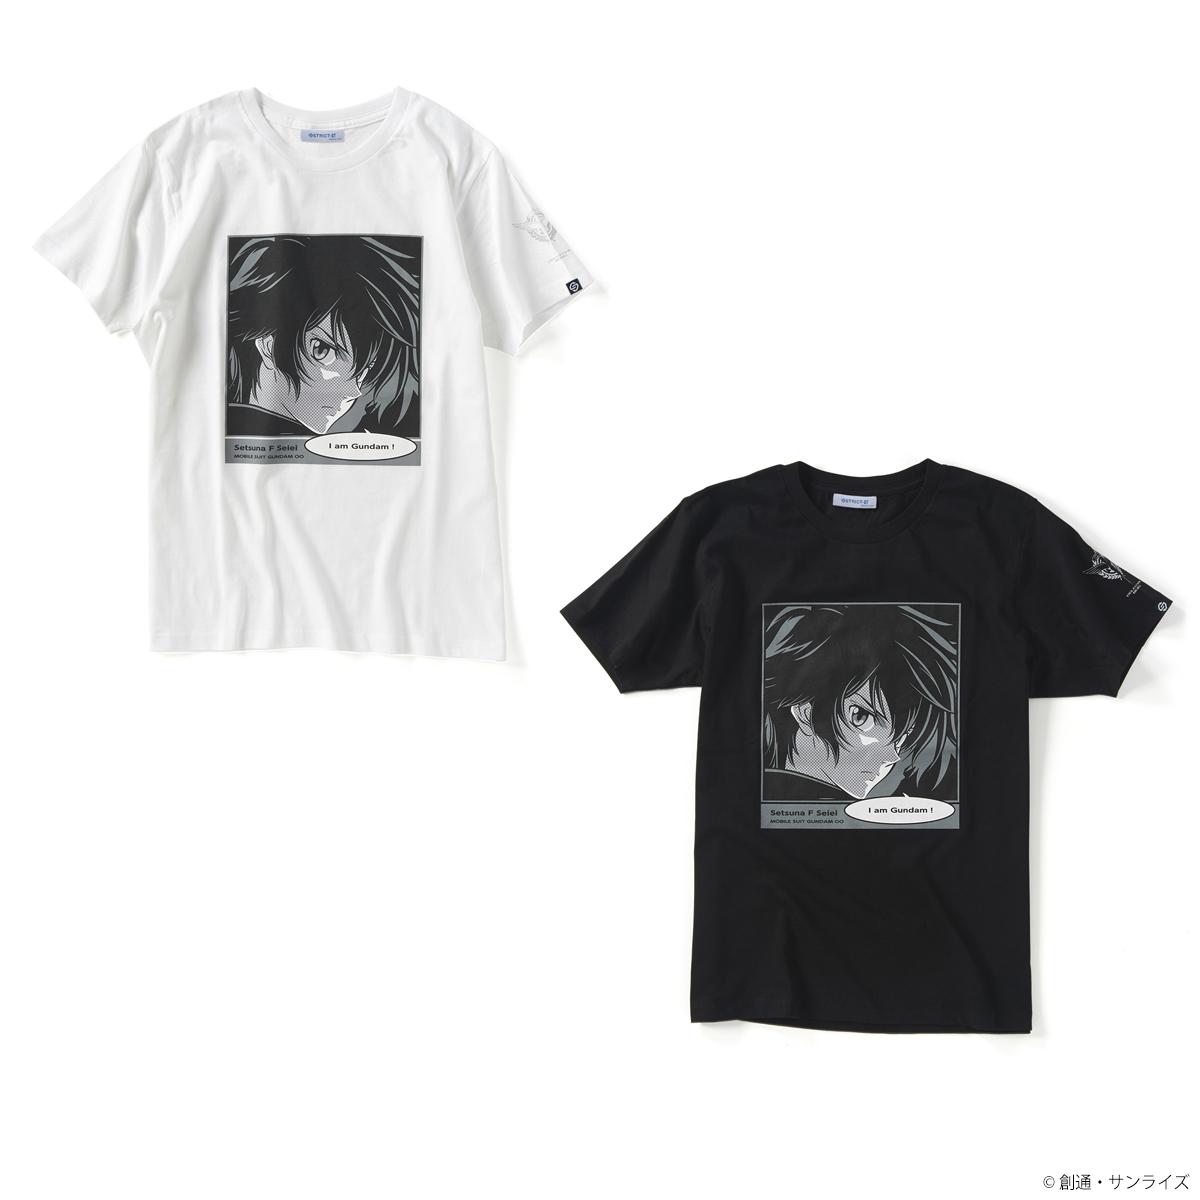 STRICT-G 『機動戦士ガンダム00』 POP ART Tシャツ 刹那・F・セイエイ